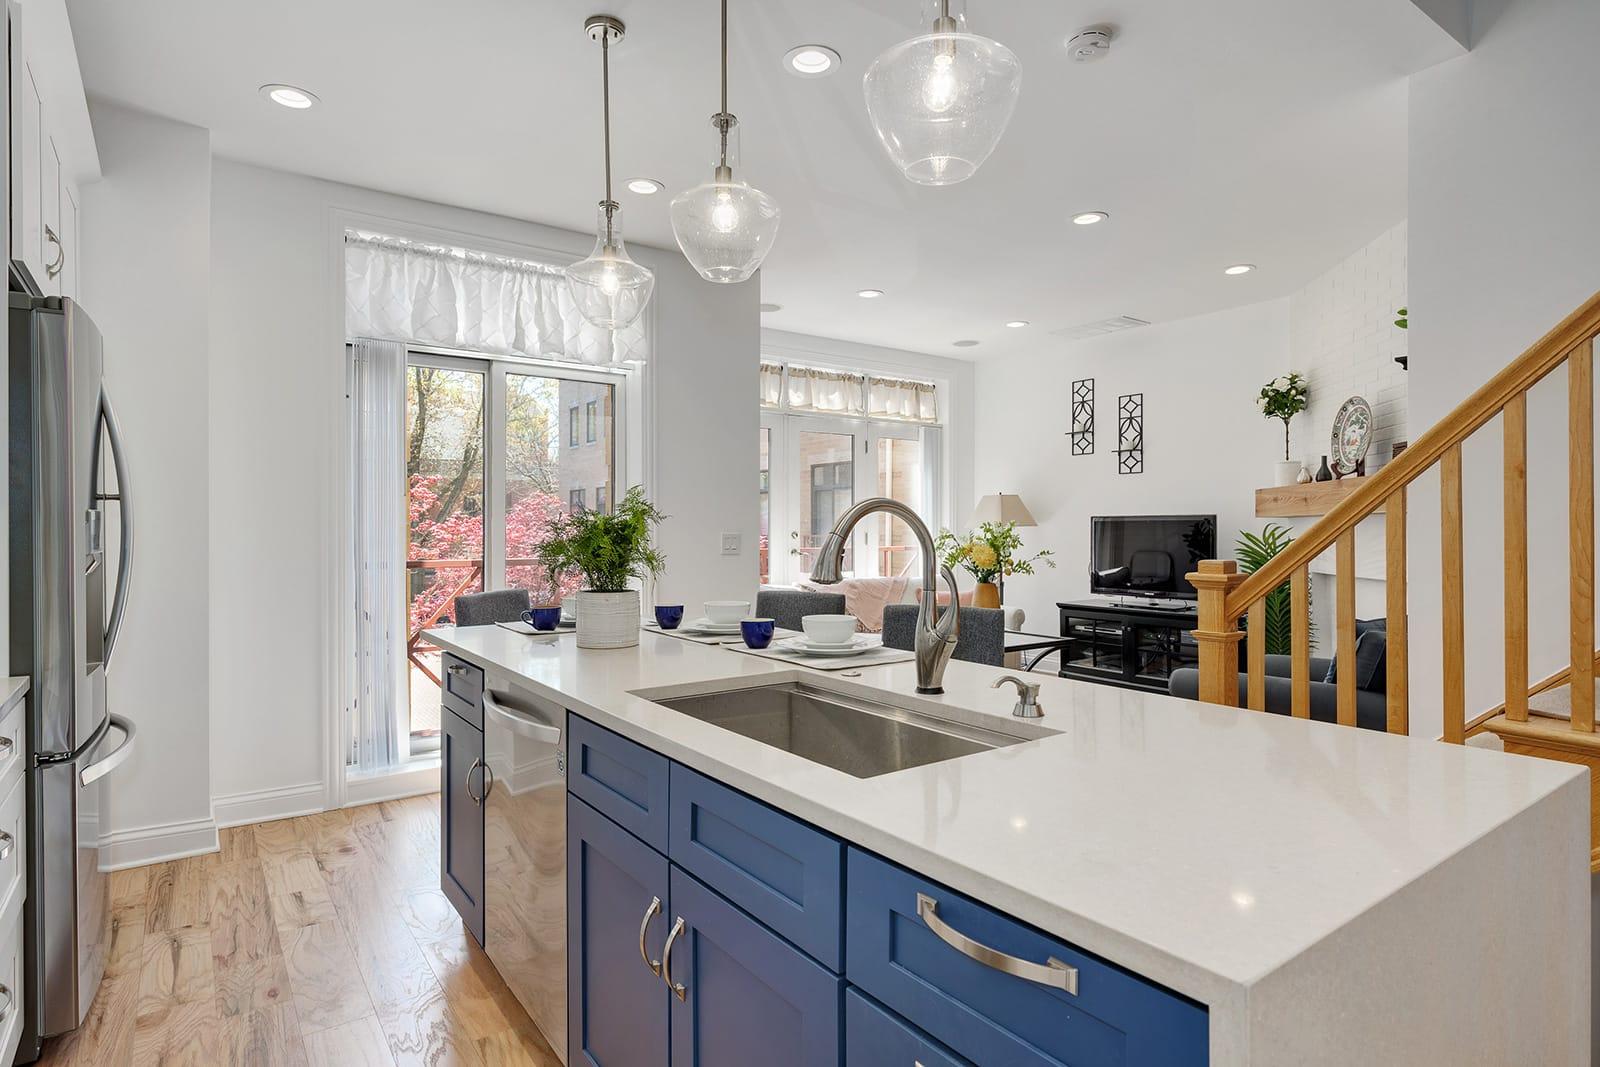 Lake View Kitchen, Bathroom & Fireplace Remodel